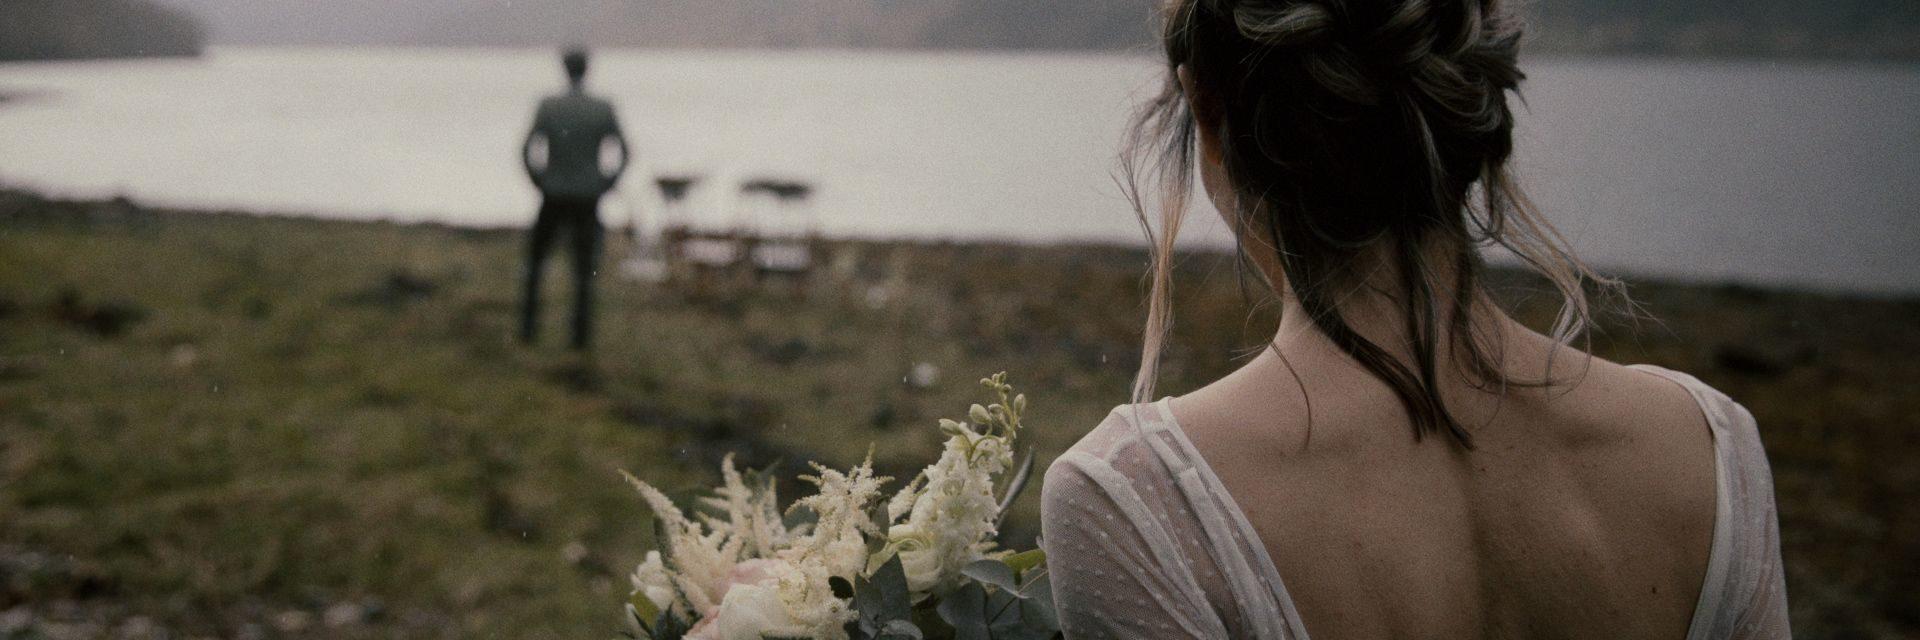 porto-wedding-videographer-cinemate-films-02